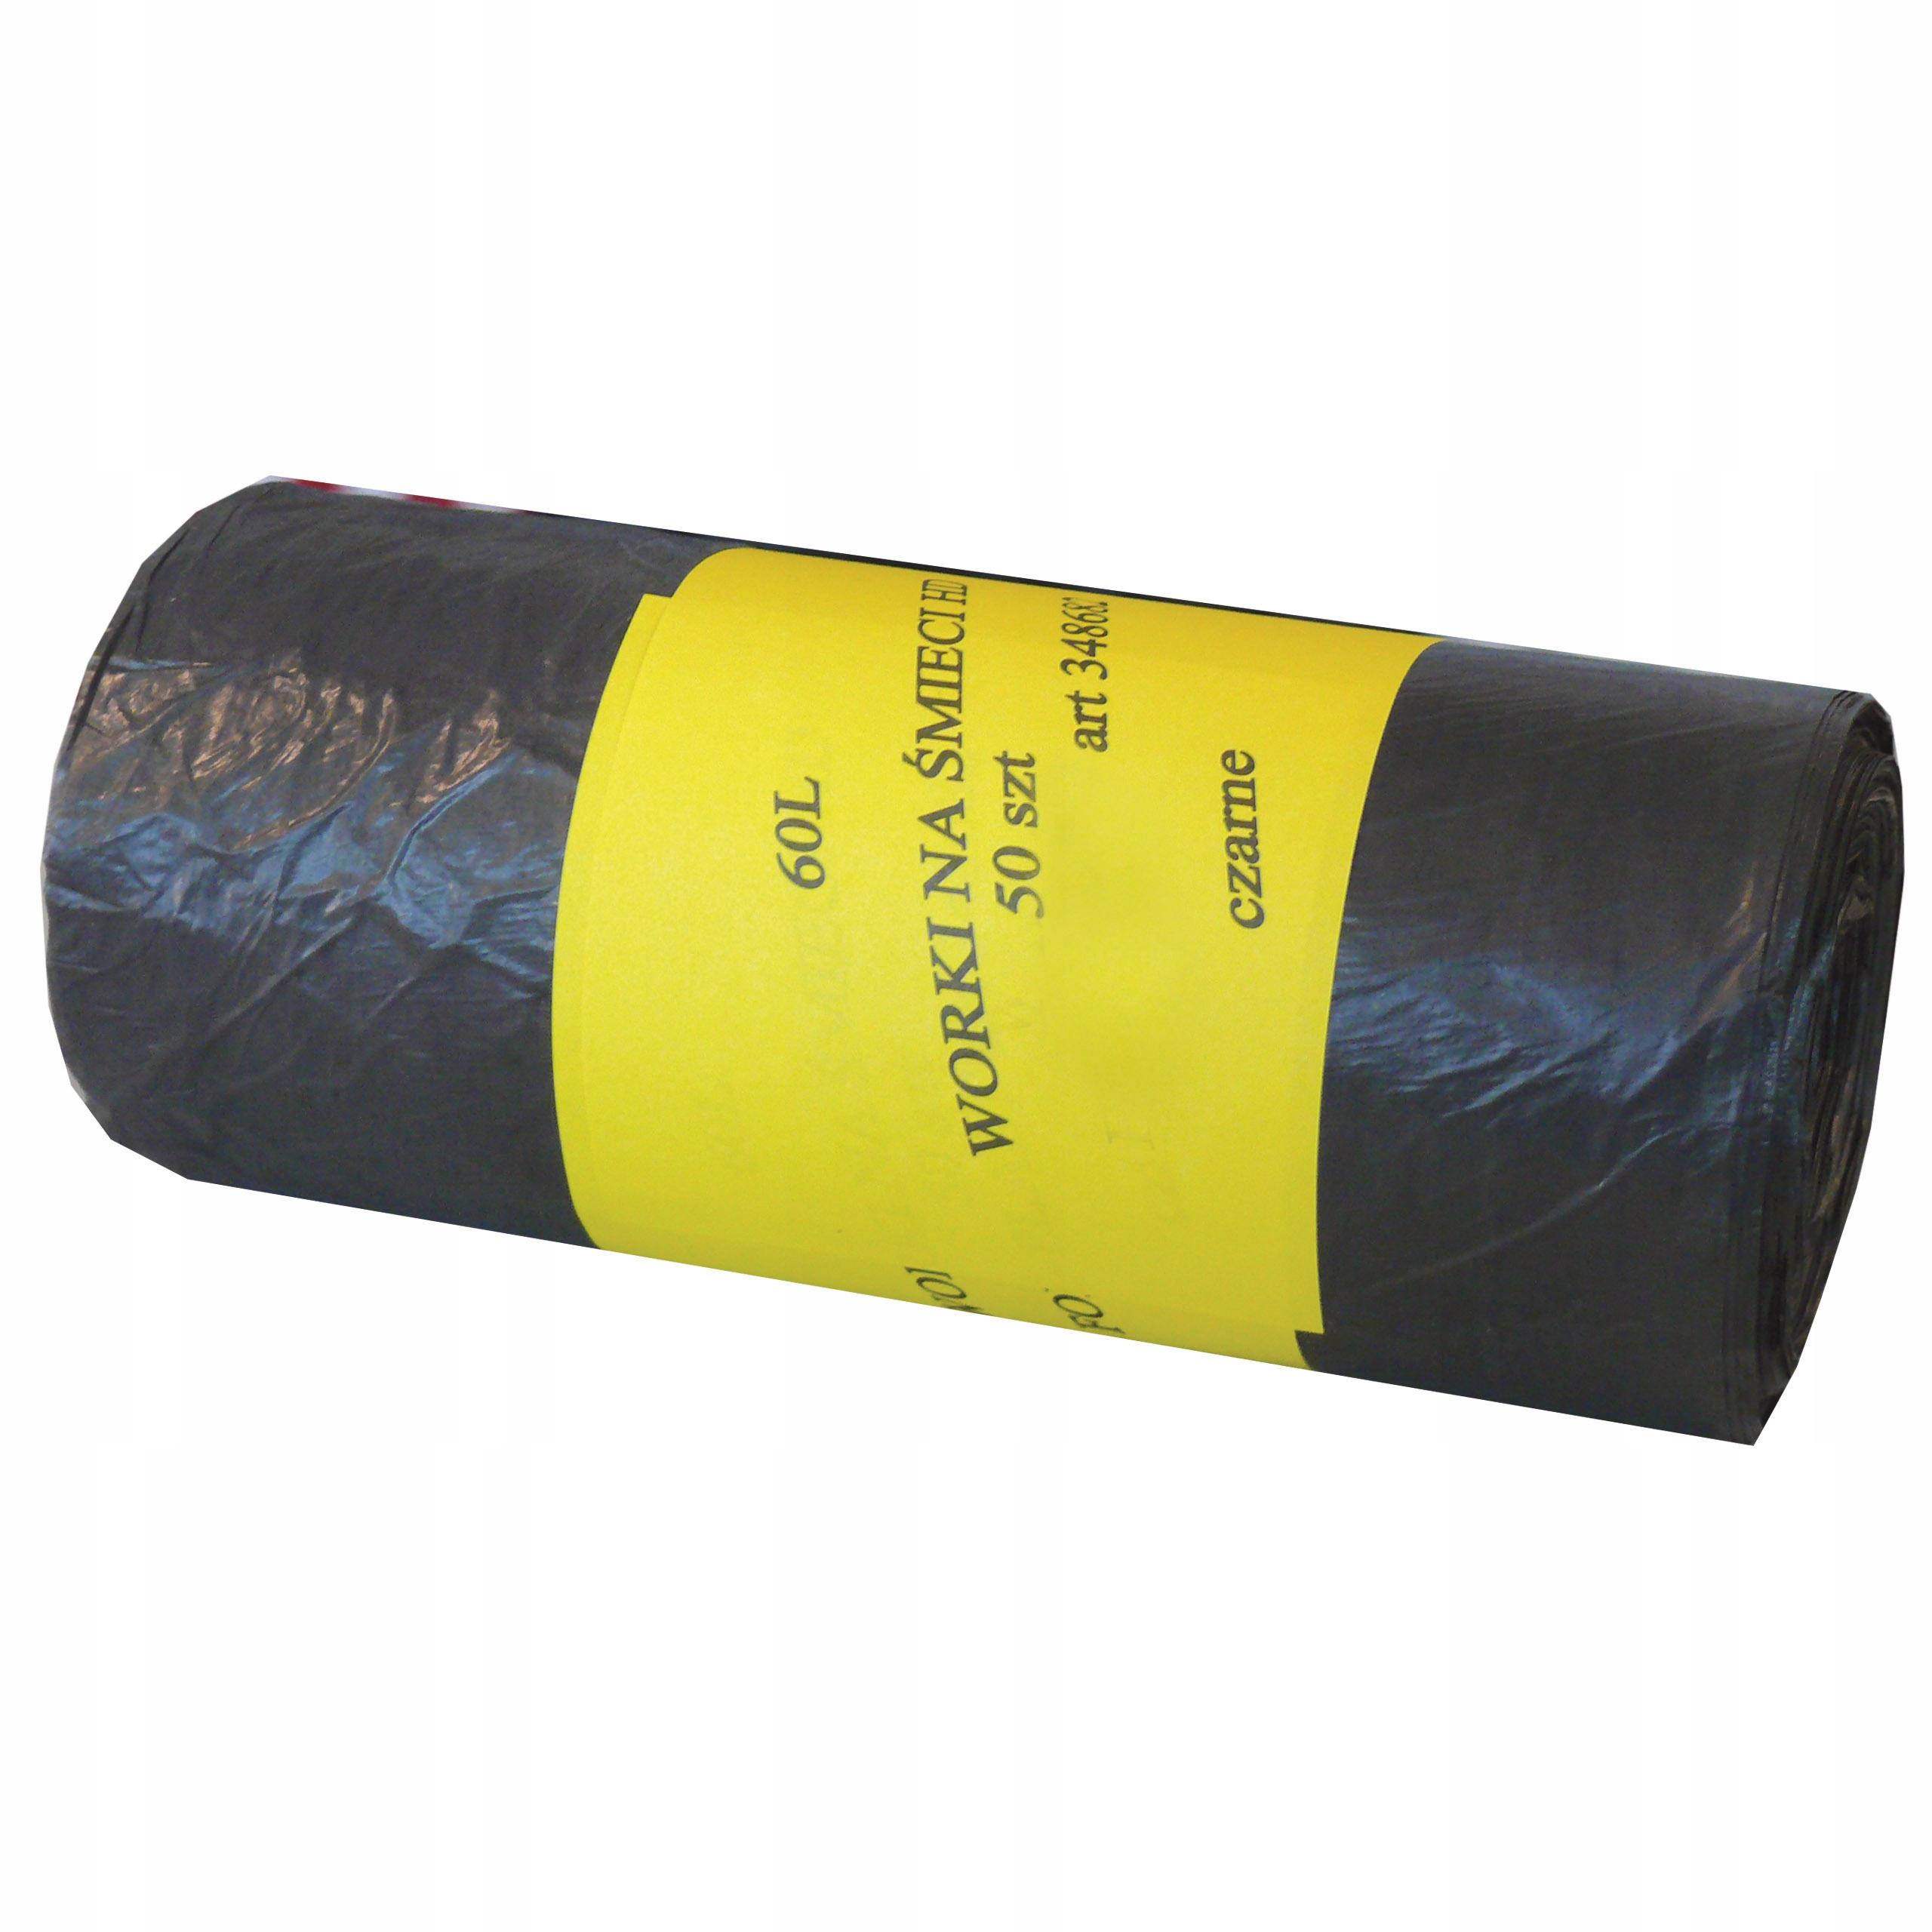 мешки для мусора HDPE 60Л 60x74 см, А'50 1rolka